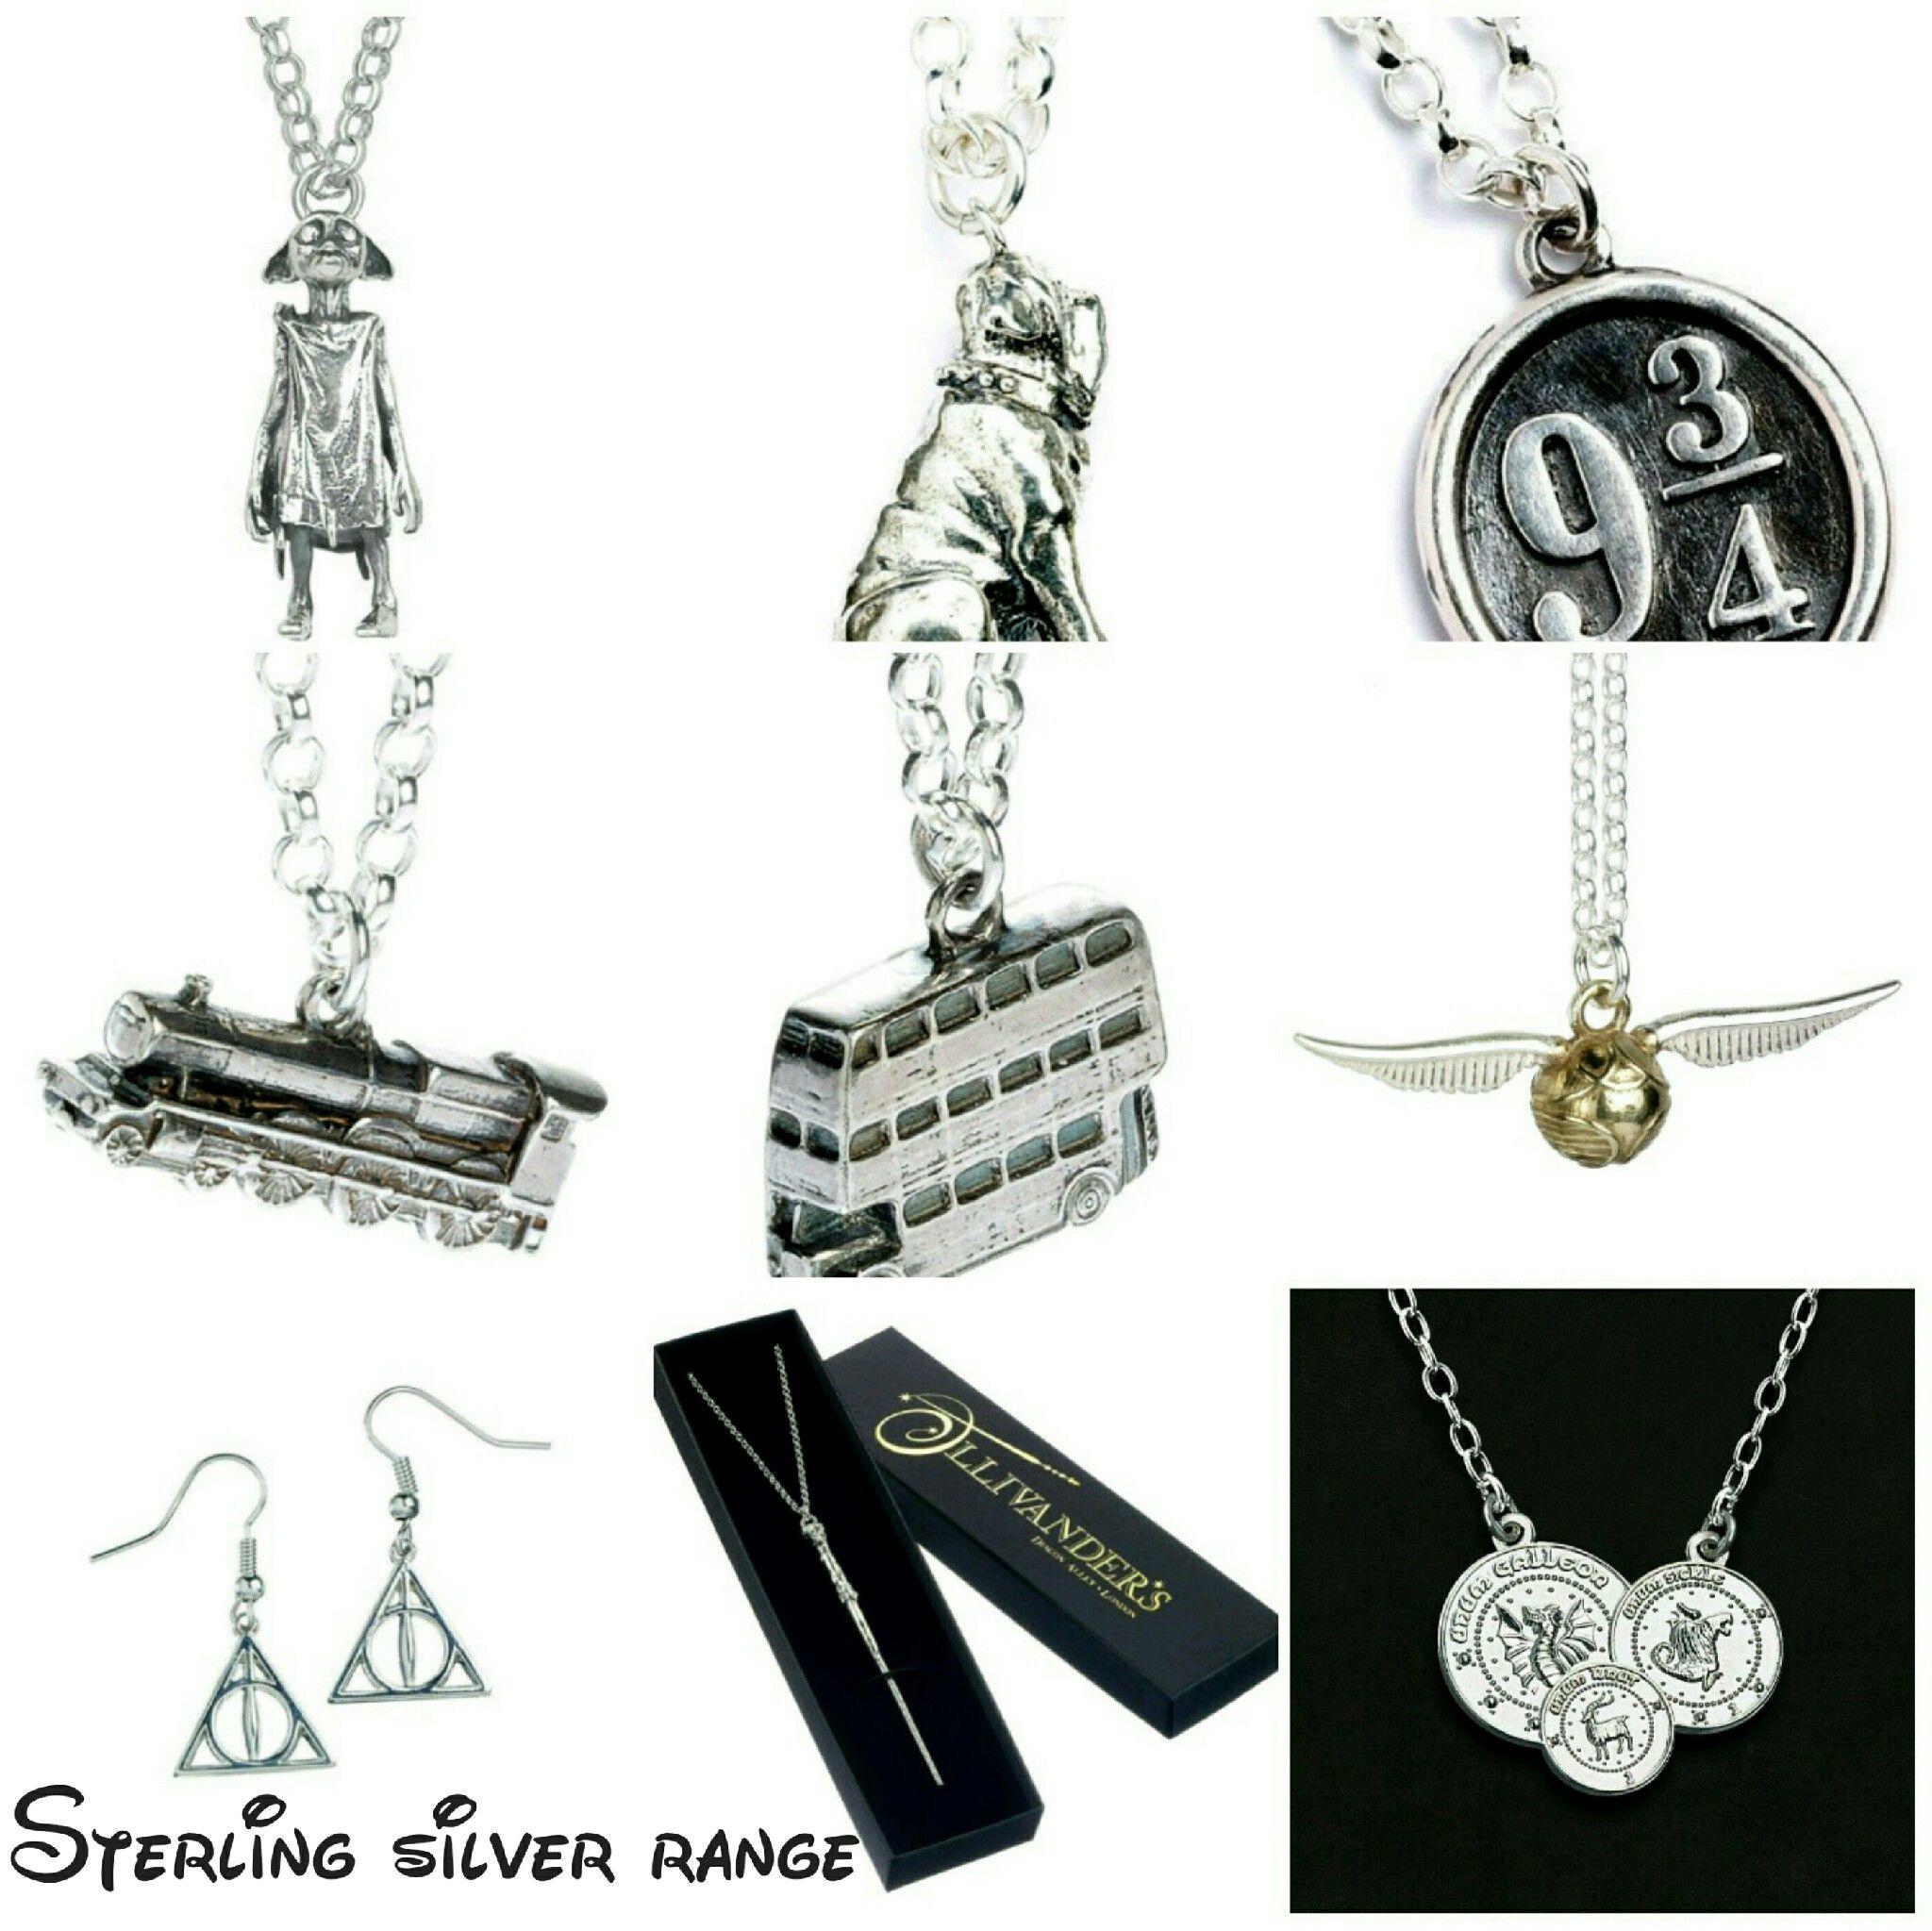 Sterling silver range in stock now harrypotter Hogwarts